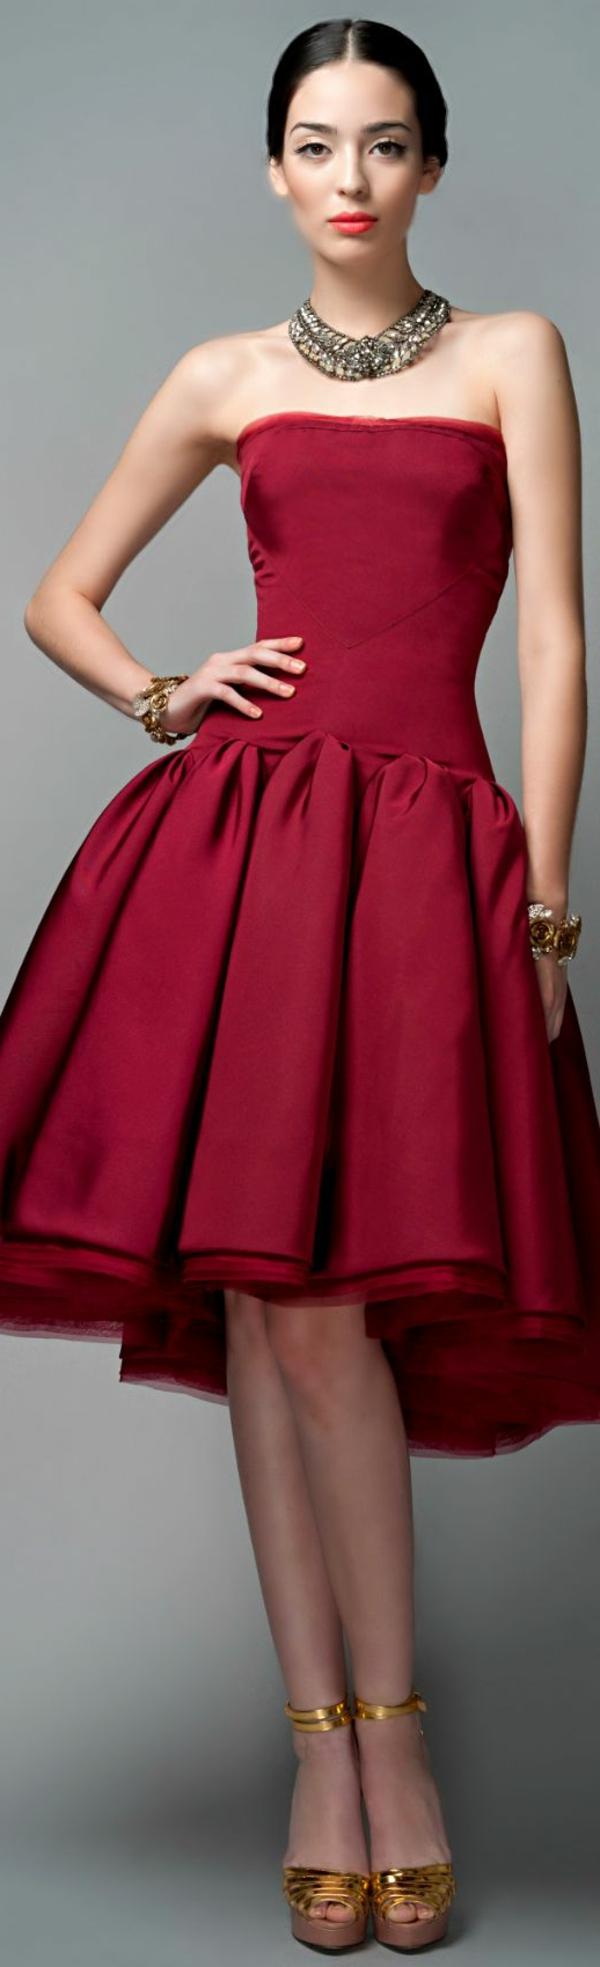 1-robe-pour-sortir-rouge-femme-brunette